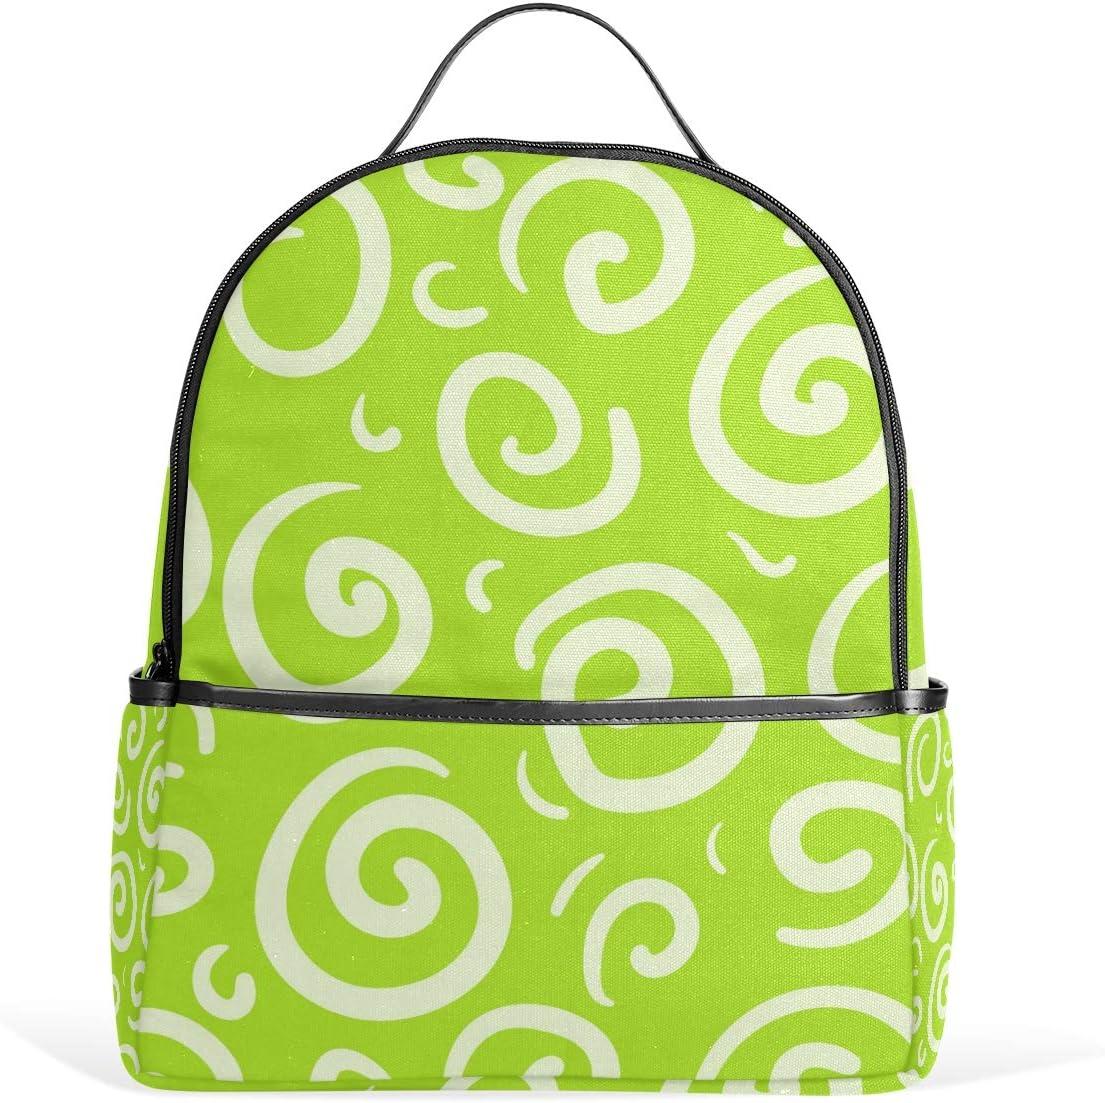 FANTAZIO handbag shoulder White Circle Green Background shoulder Handbag